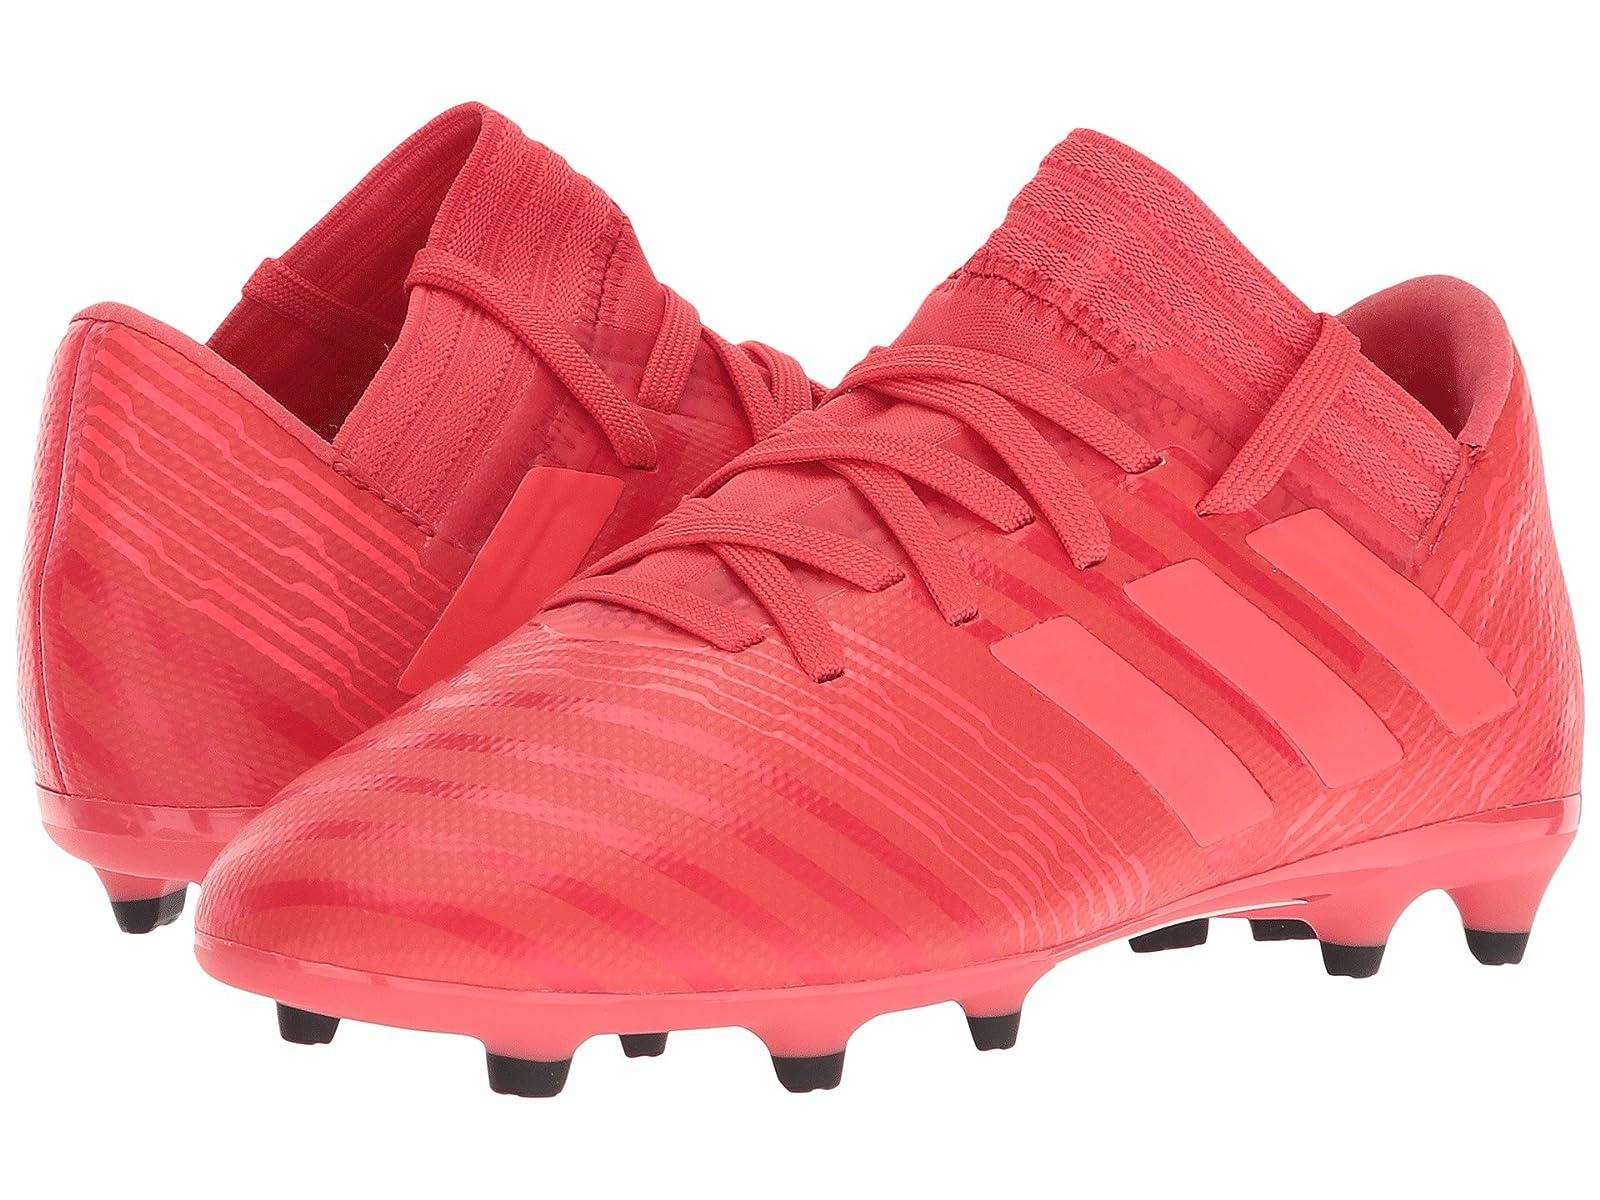 adidas Kids Nemeziz 17.3 FG J Soccer (Little Kid/Big Kid)Stylish and characteristic shoes